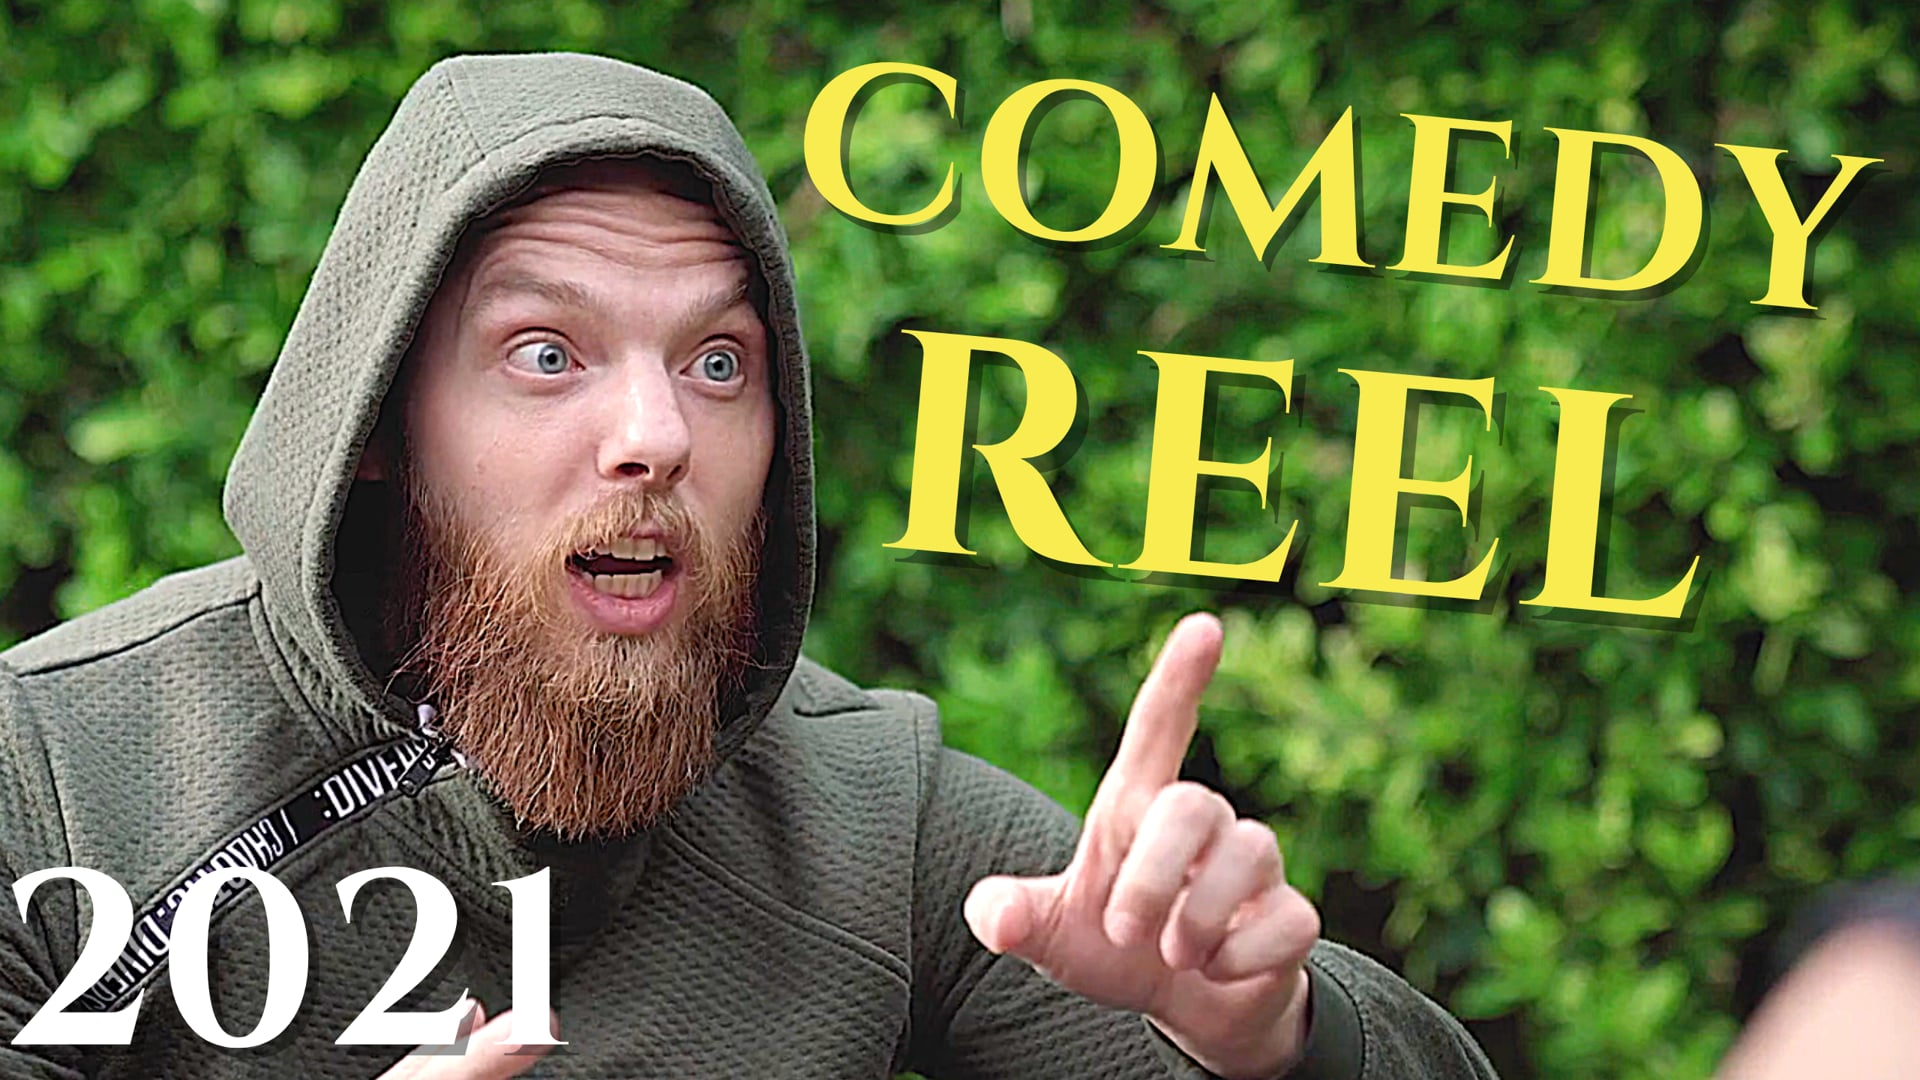 Comedy Reel - March 2021 - Aramis merlin